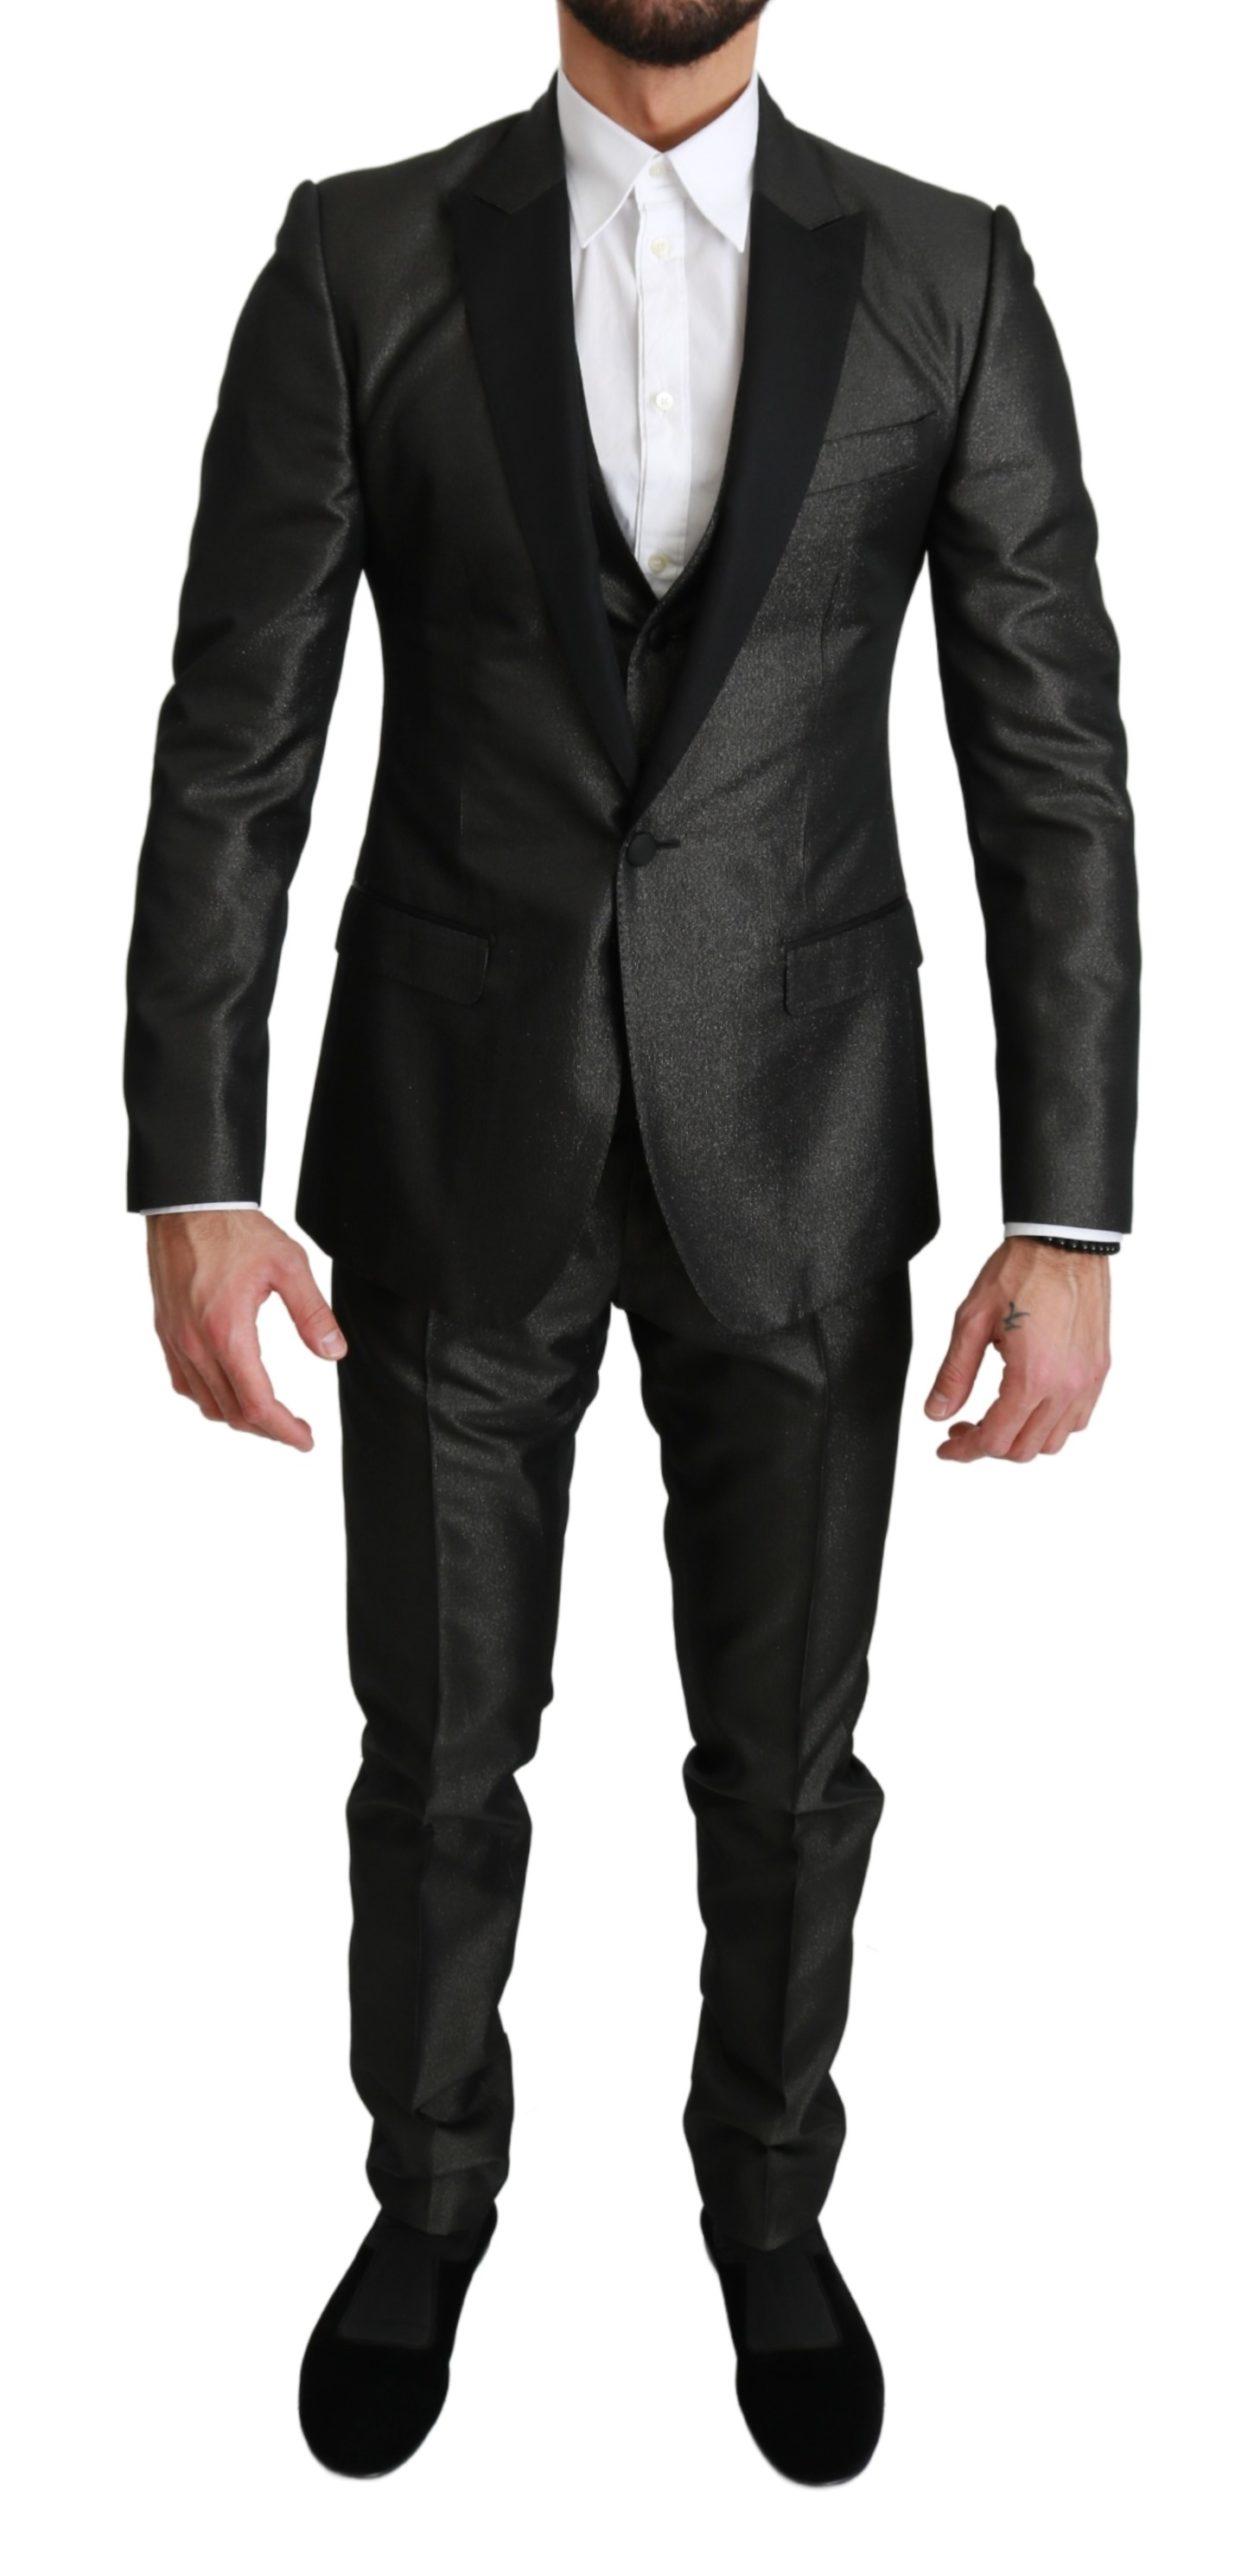 Dolce & Gabbana Men's Single Breasted 3 Piece MARTINI Suit Gray KOS1661 - IT44   XS